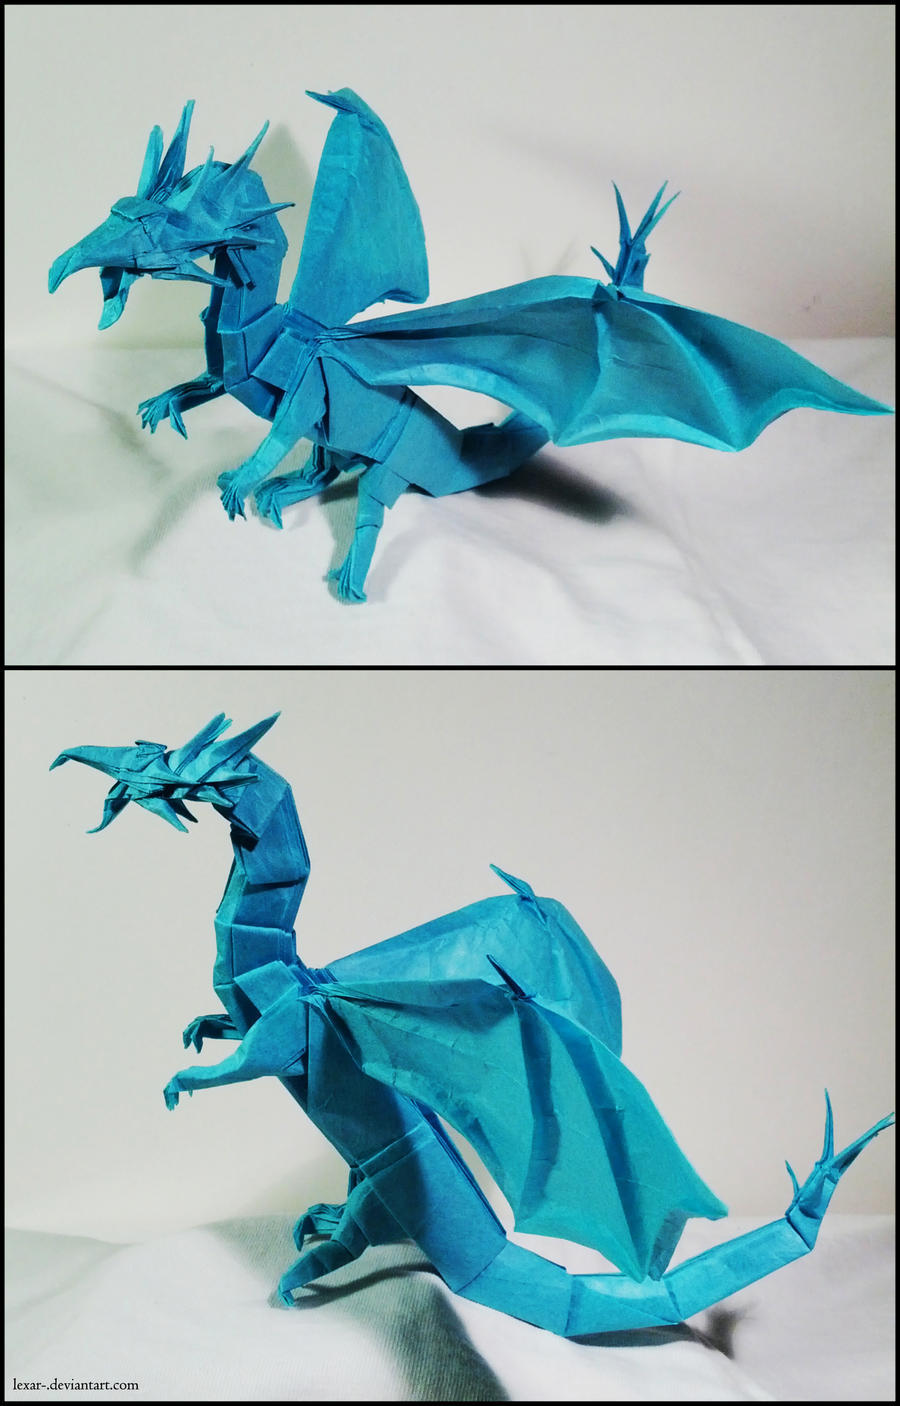 How to make an Origami Simple Dragon (Shuki Kato) - YouTube | 1406x900